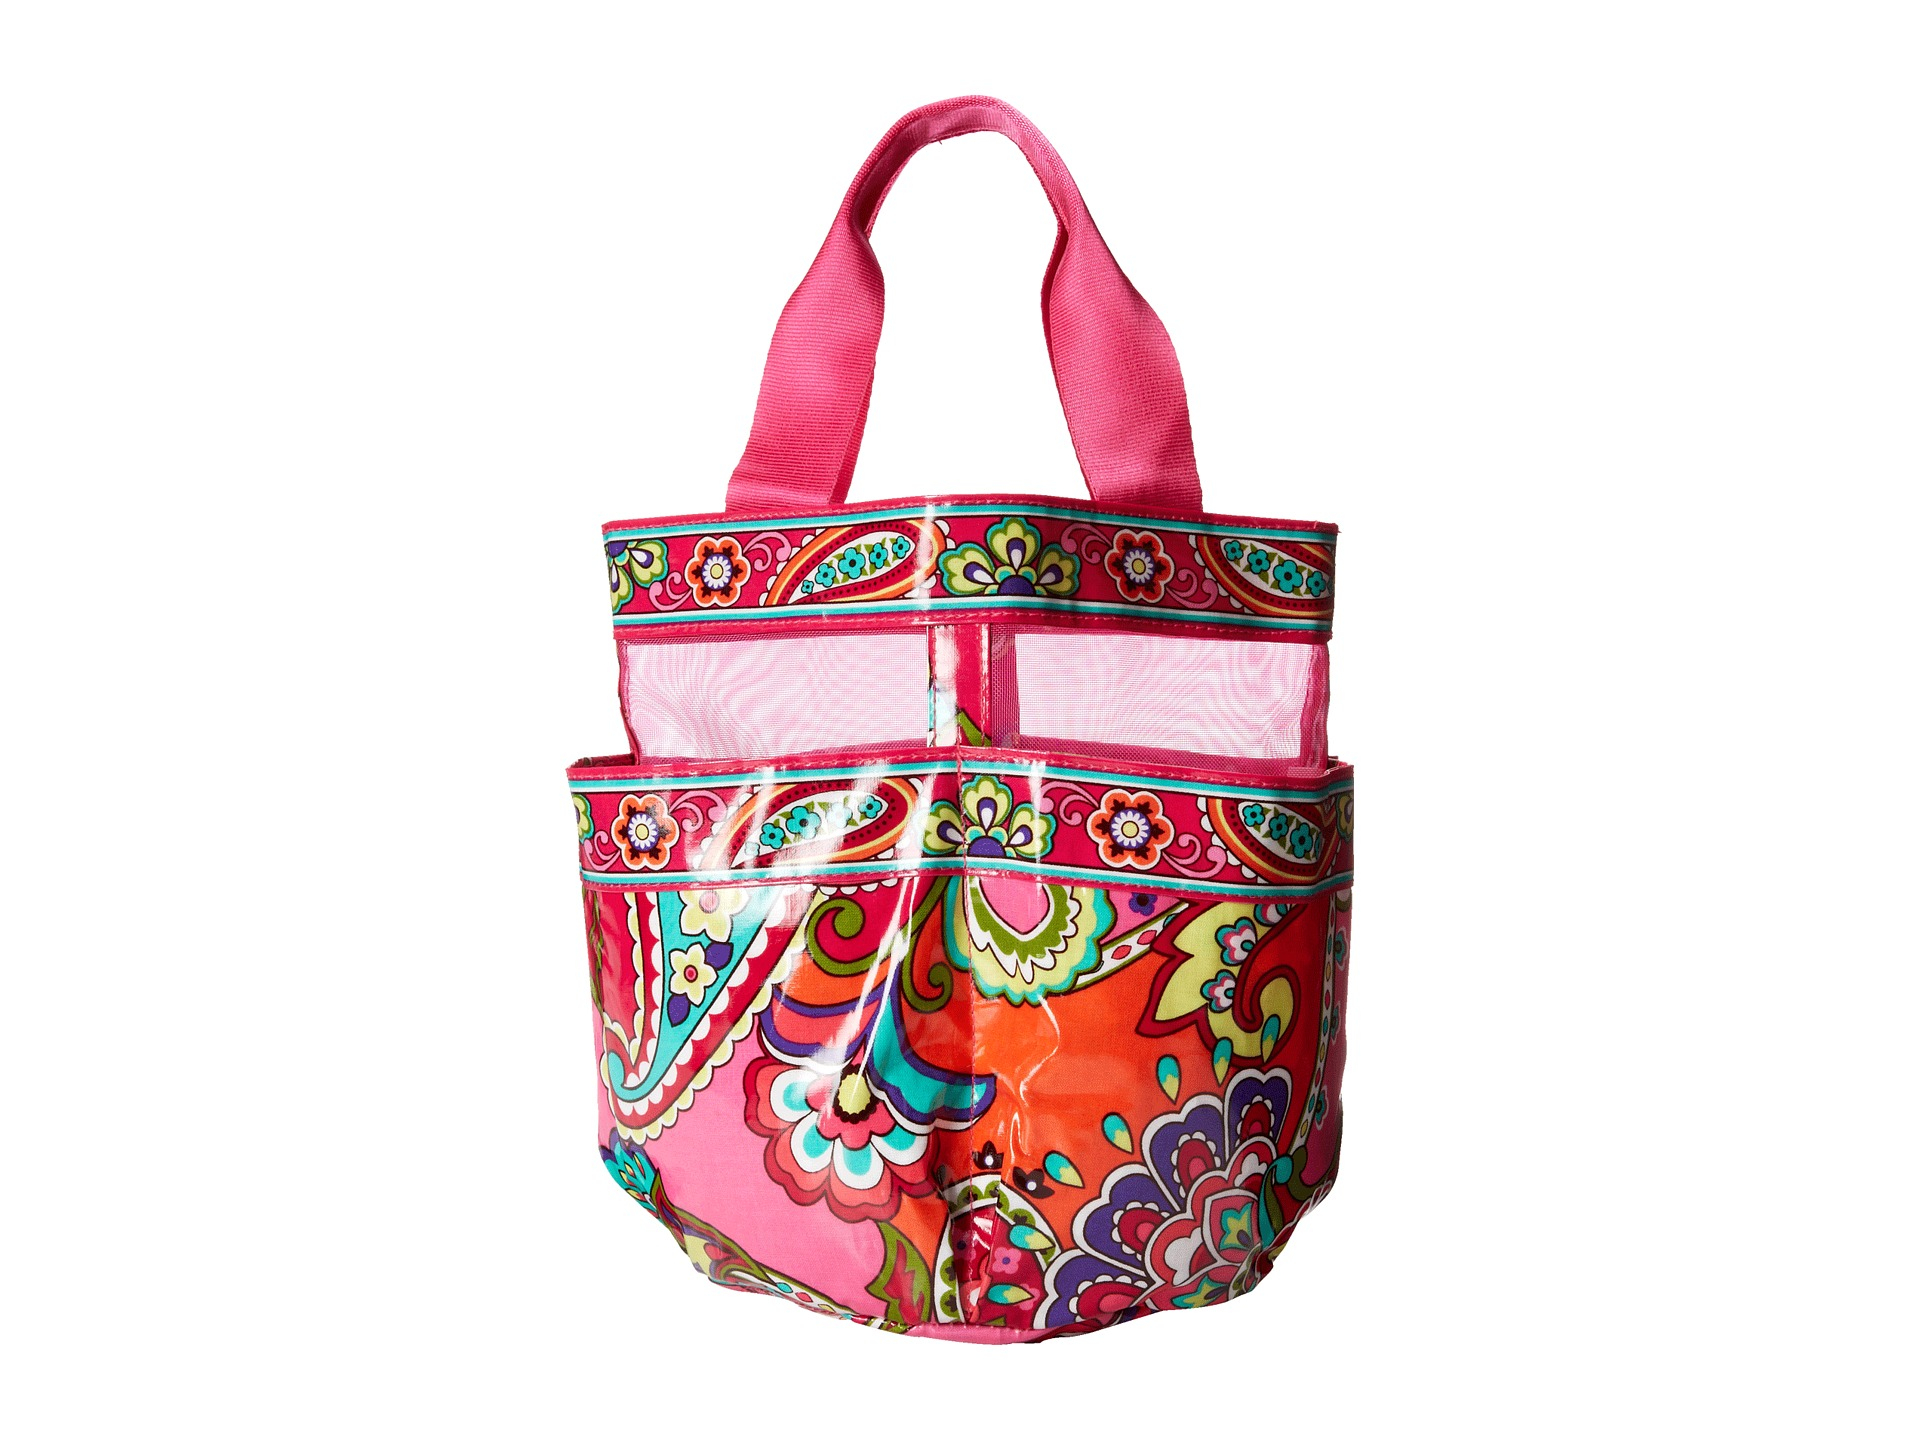 Vera bradley shower caddy in pink pink swirls lyst for Vera bradley bathroom bag